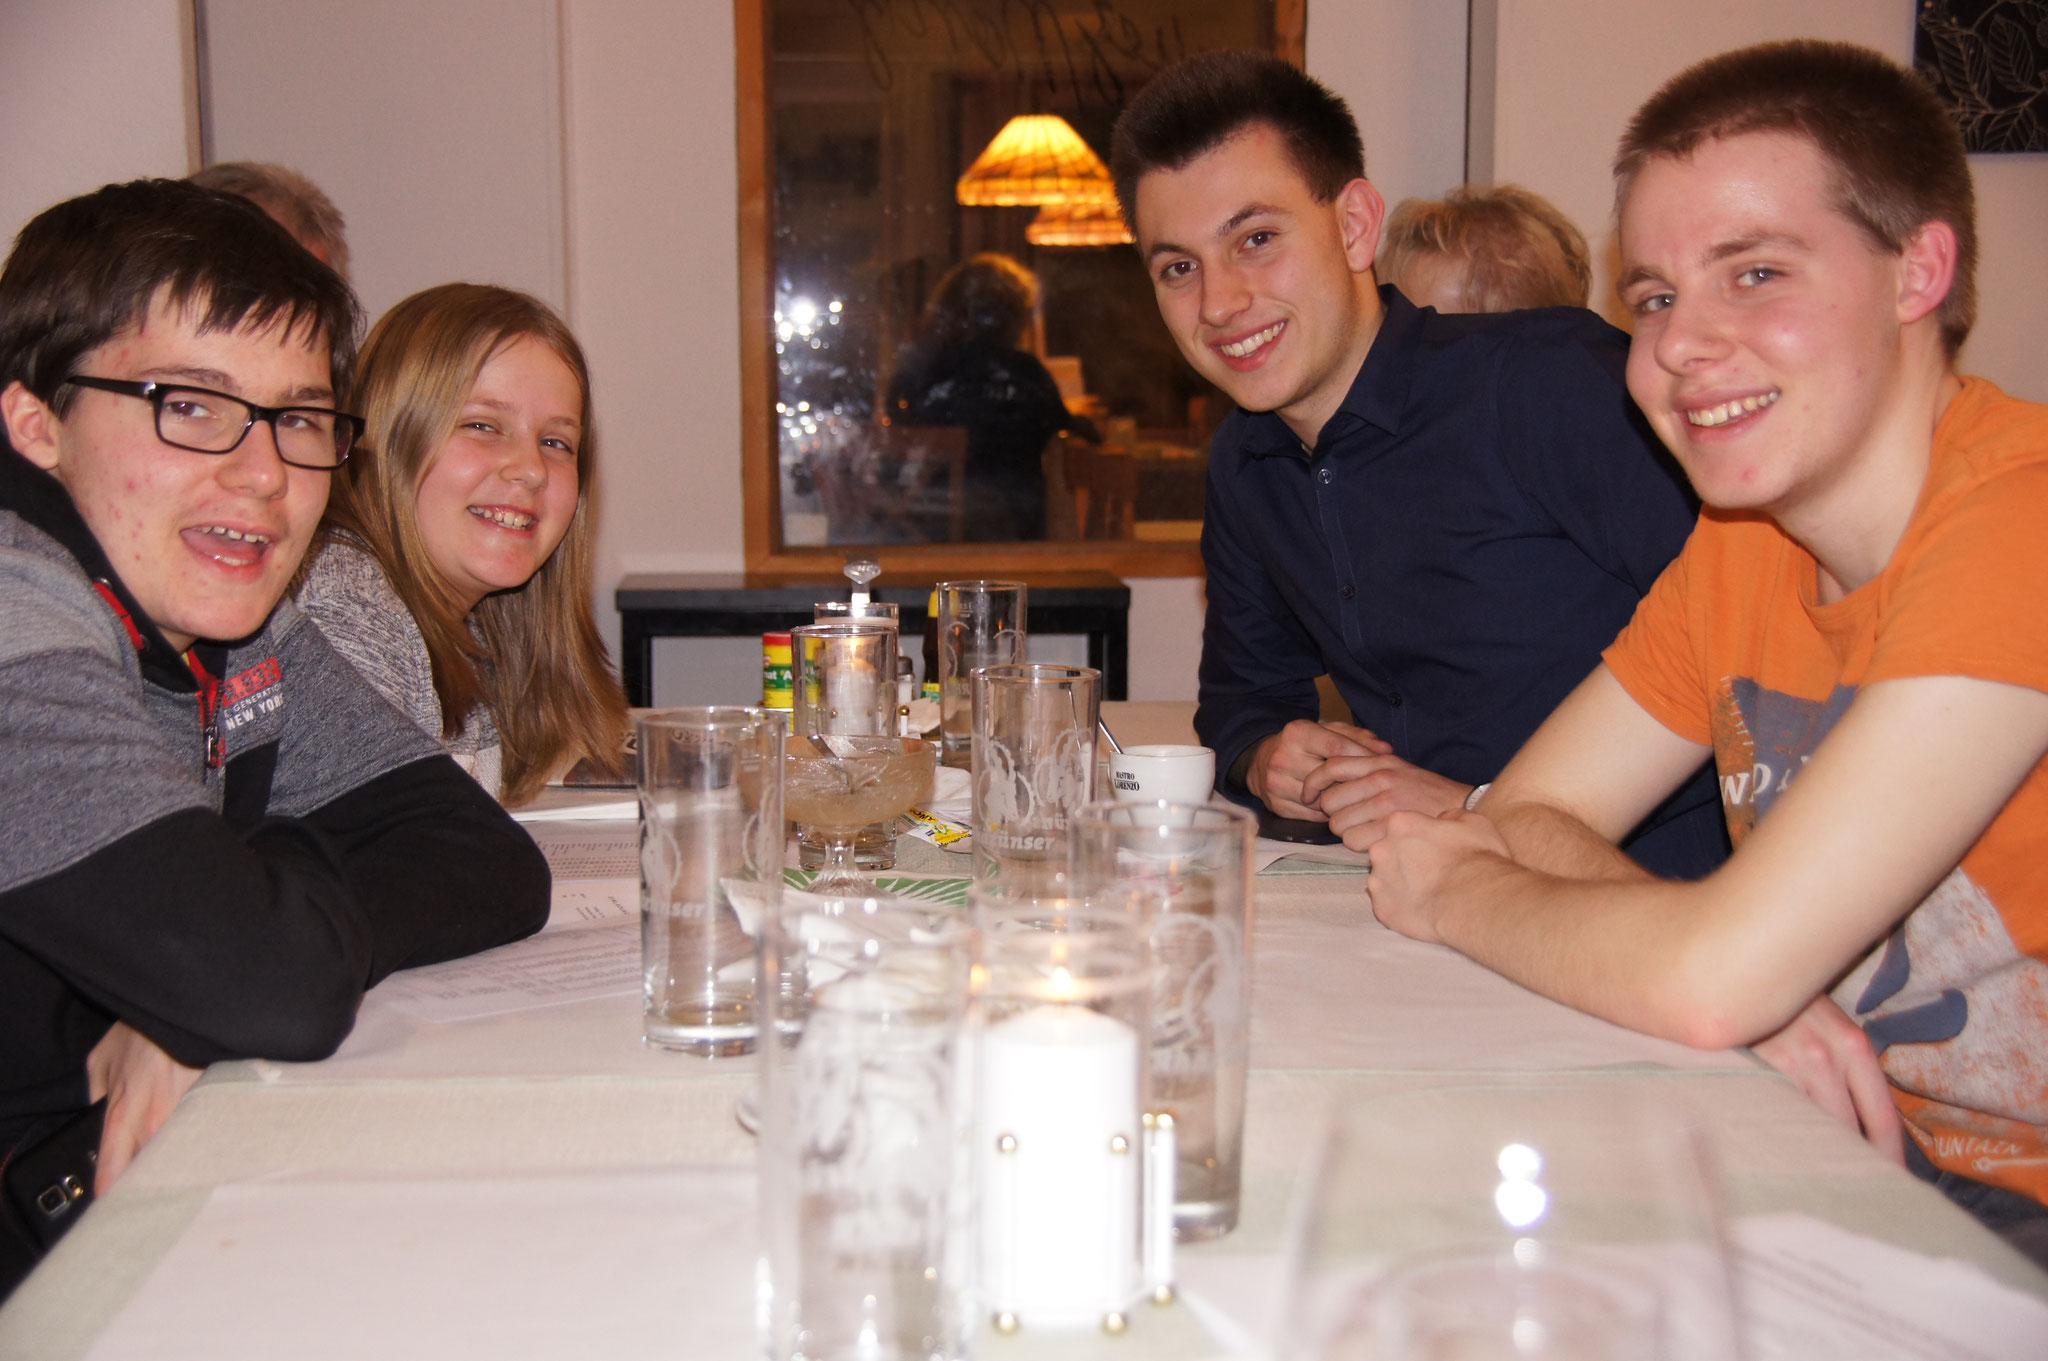 Unsere 4 jüngsten Mitglieder: (v.l.) Kian, Vivien, Kerim, Colin